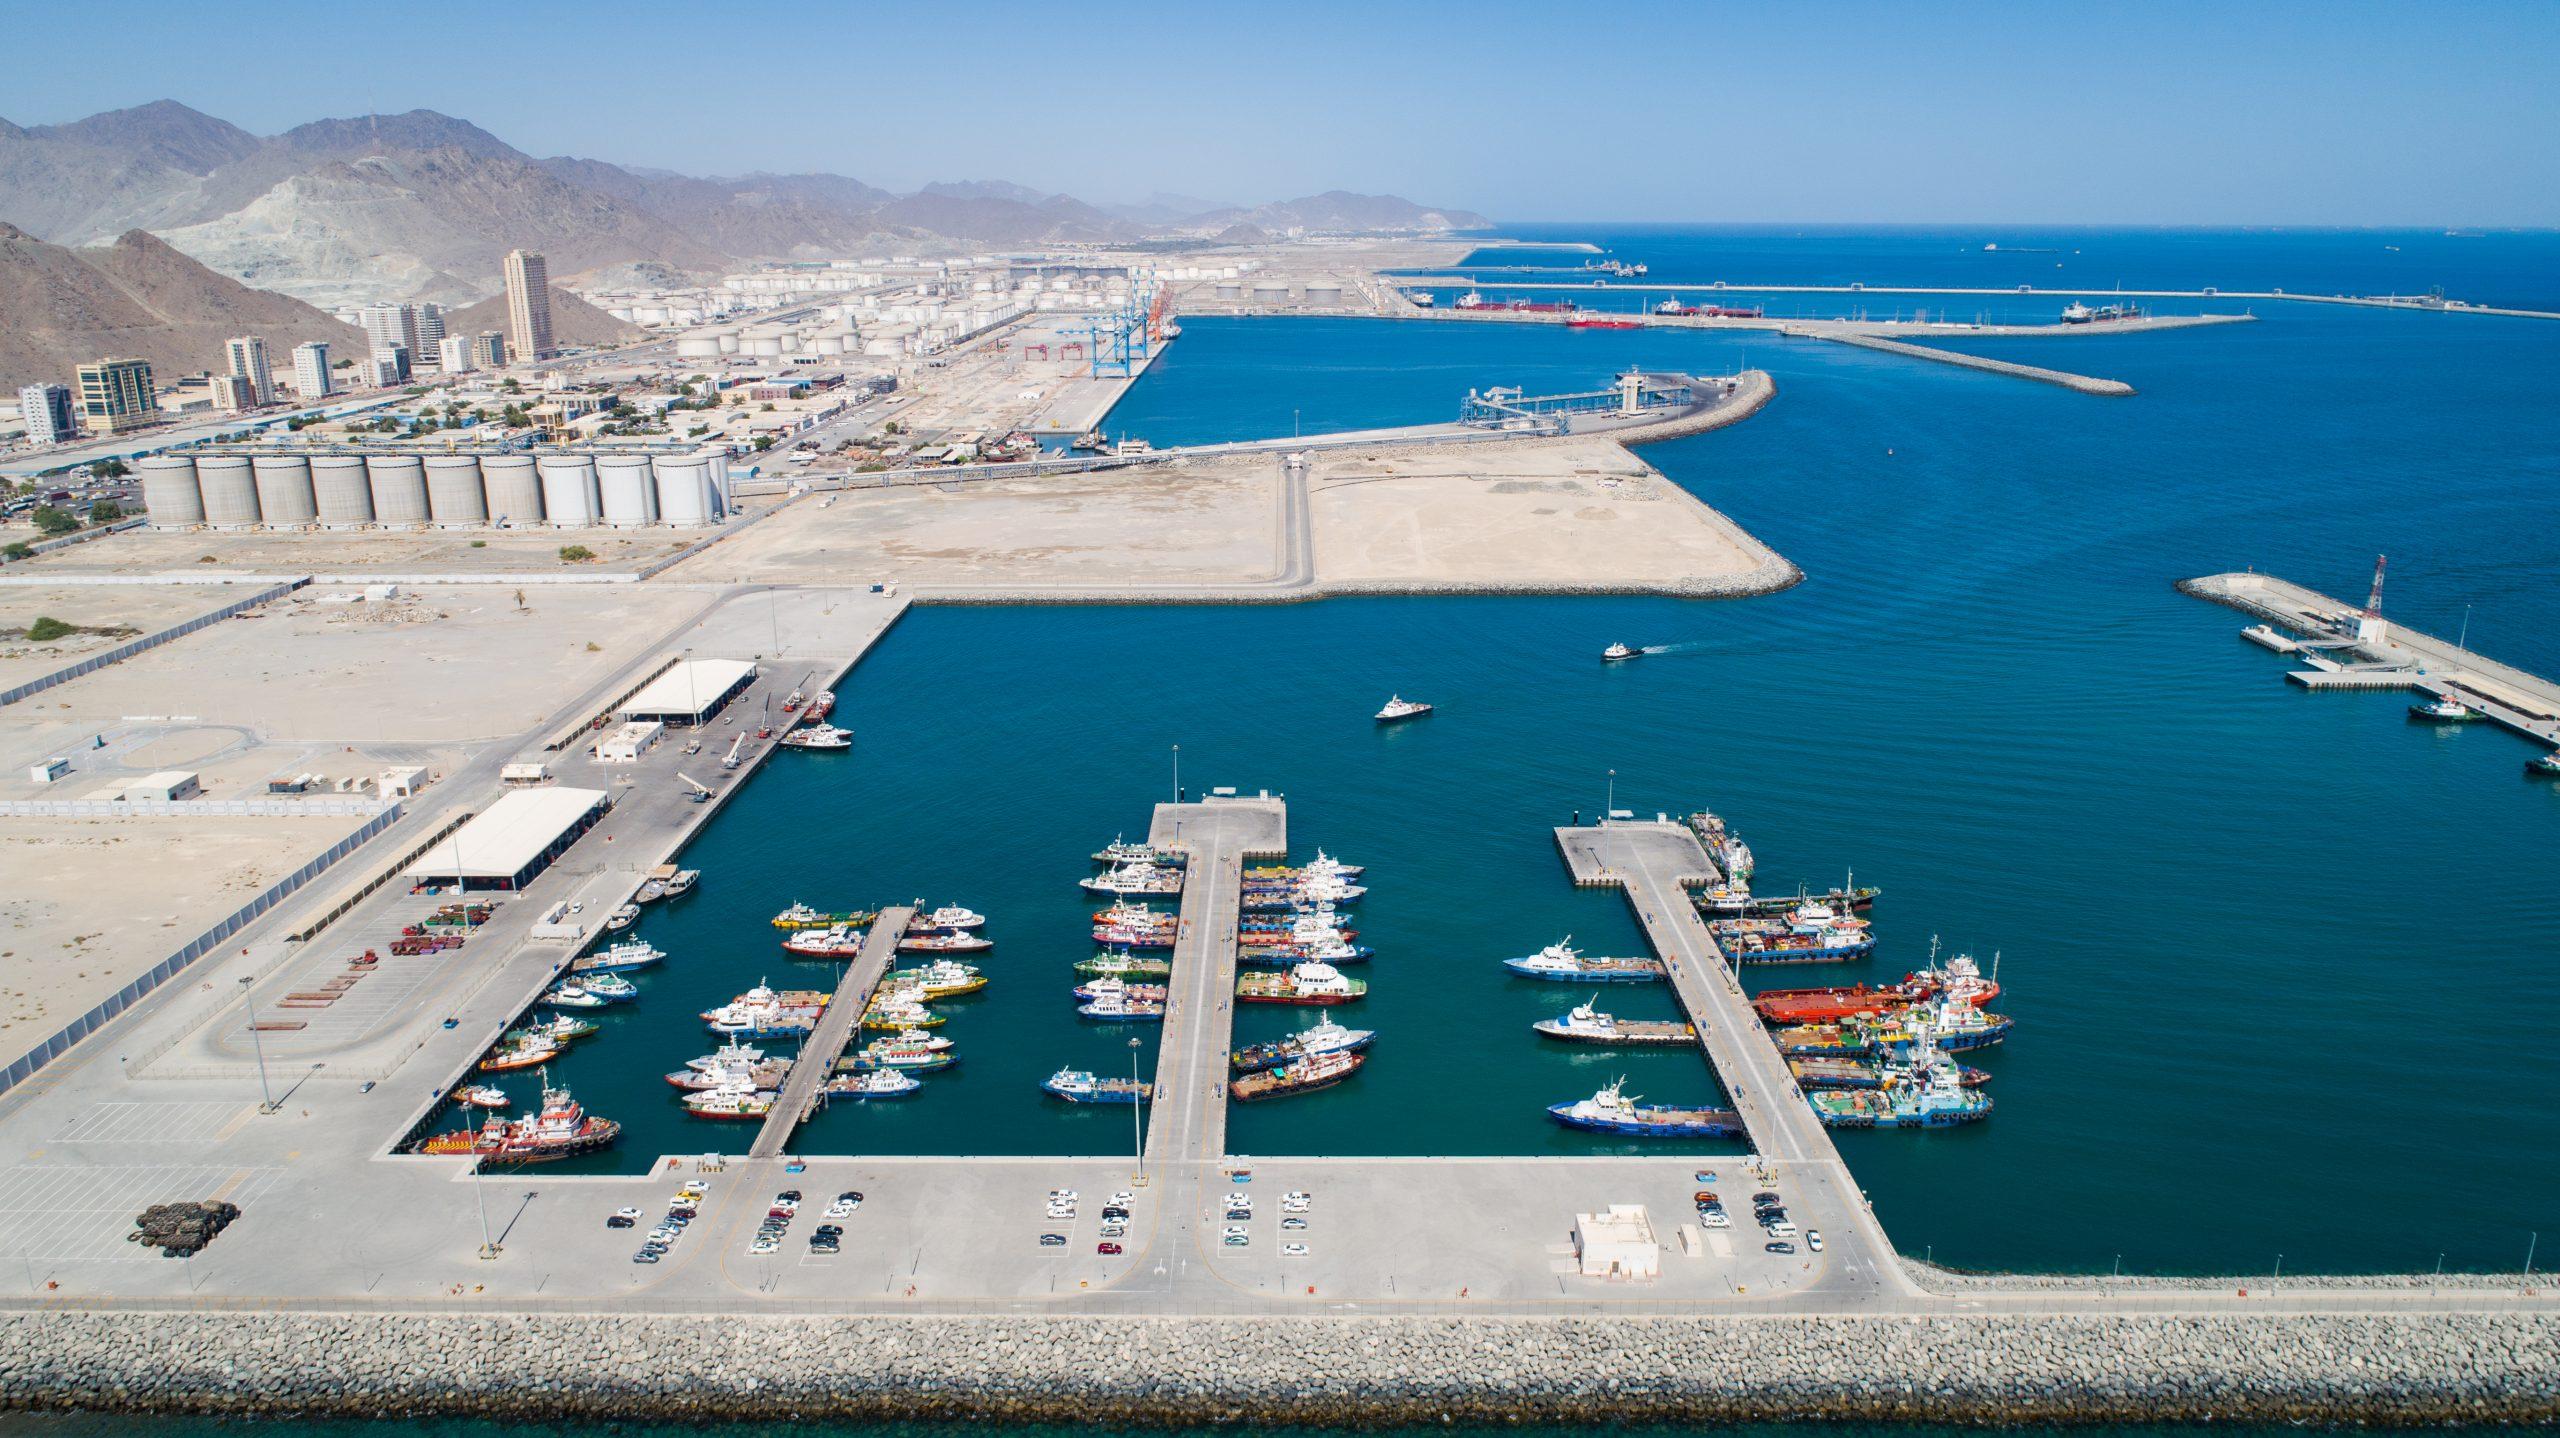 Aerial View of the Port of Fujairah